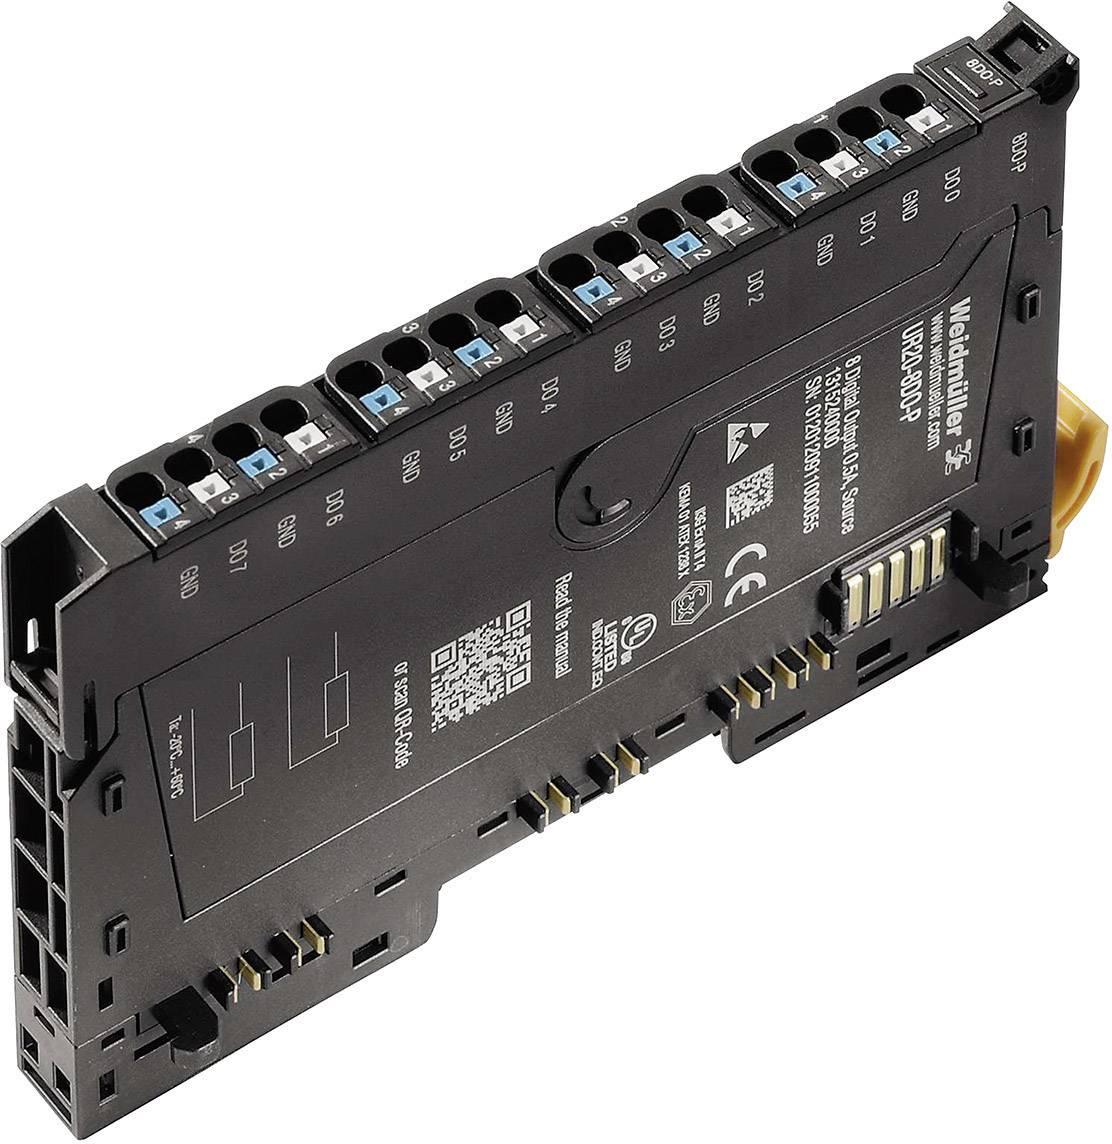 Rozšiřující modul pro PLC Weidmüller UR20-8DO-P, 1315240000